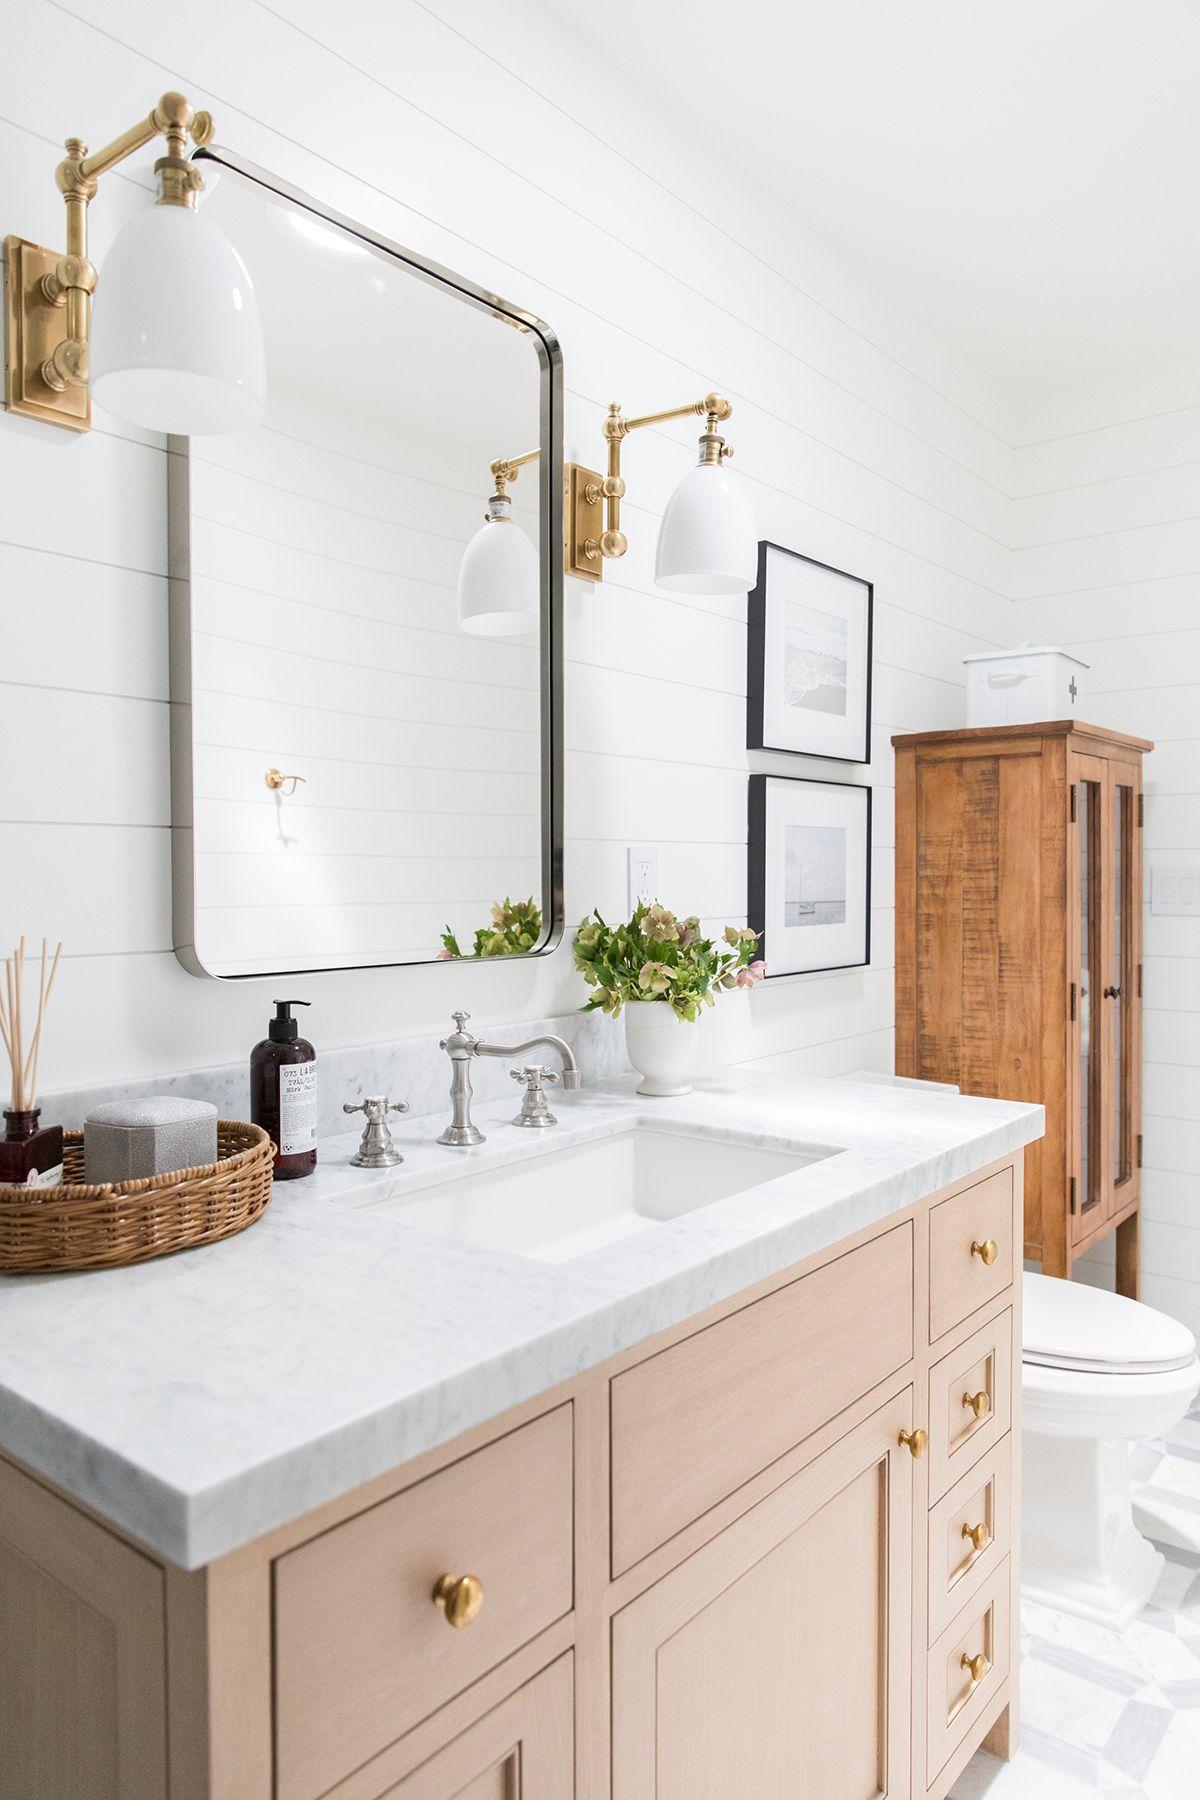 Oc Ranch Remodel Part Three Photo Tour Studio Mcgee Eclectic Bathroom Stylish Bathroom Eclectic Bathroom Design